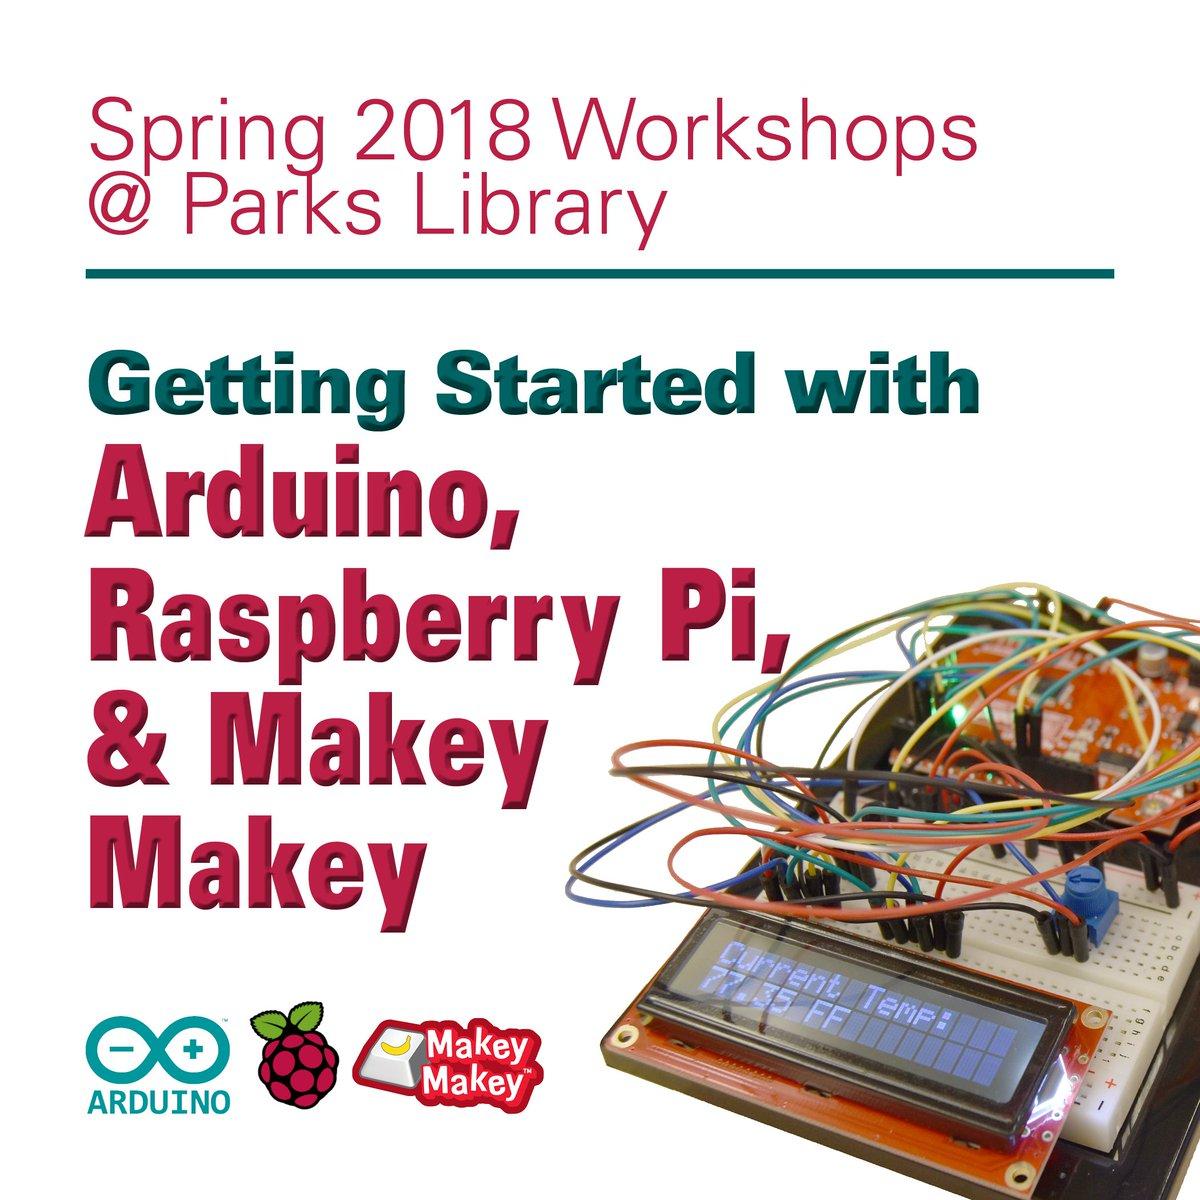 Iowa state u library isulibrary twitter spring 2018 workshops arduino infinity symbol raspberry symbol for raspberry pi keyboard key biocorpaavc